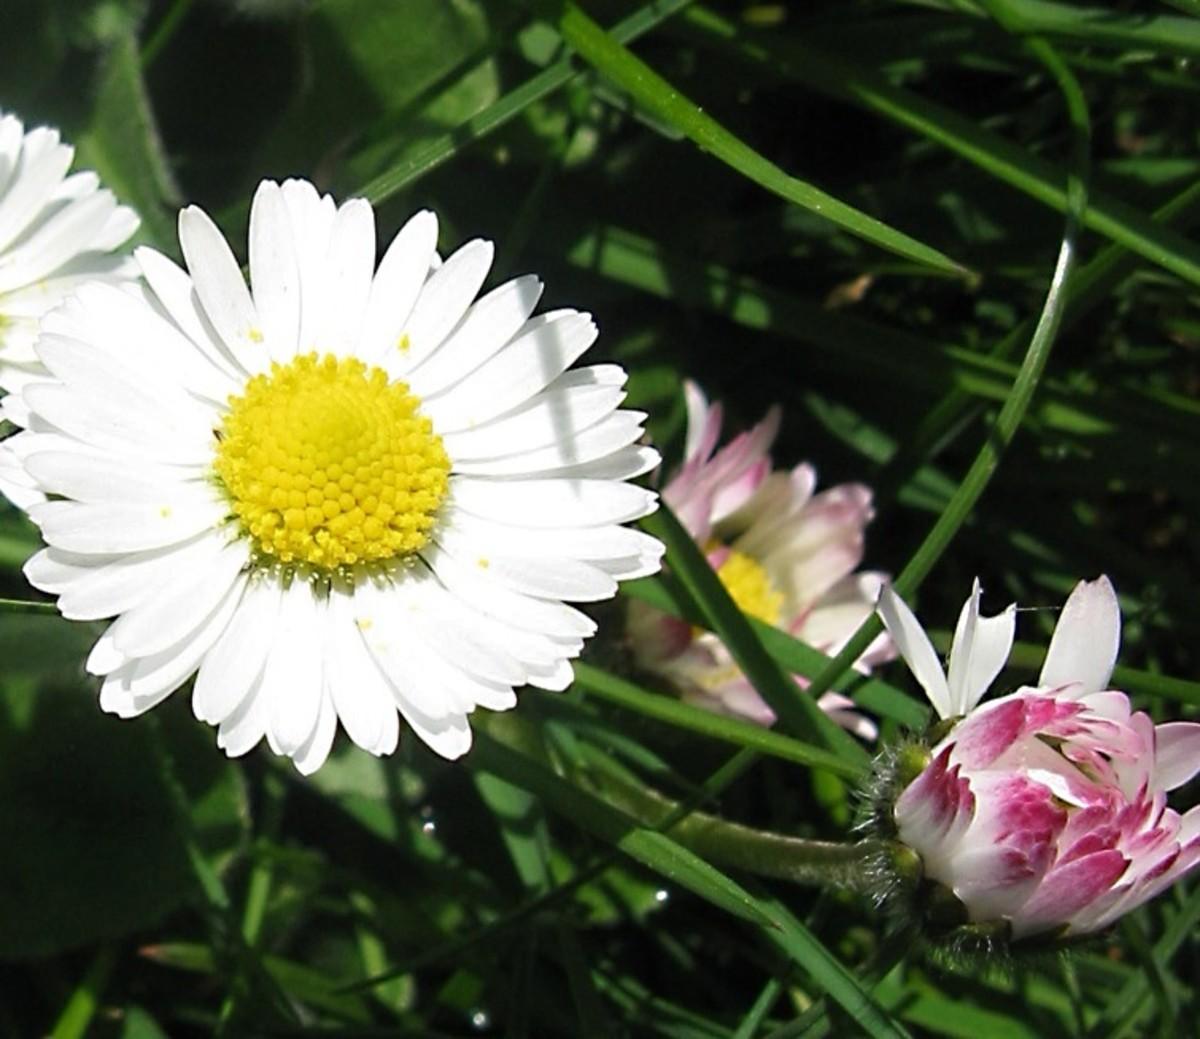 A daisy in sunlight